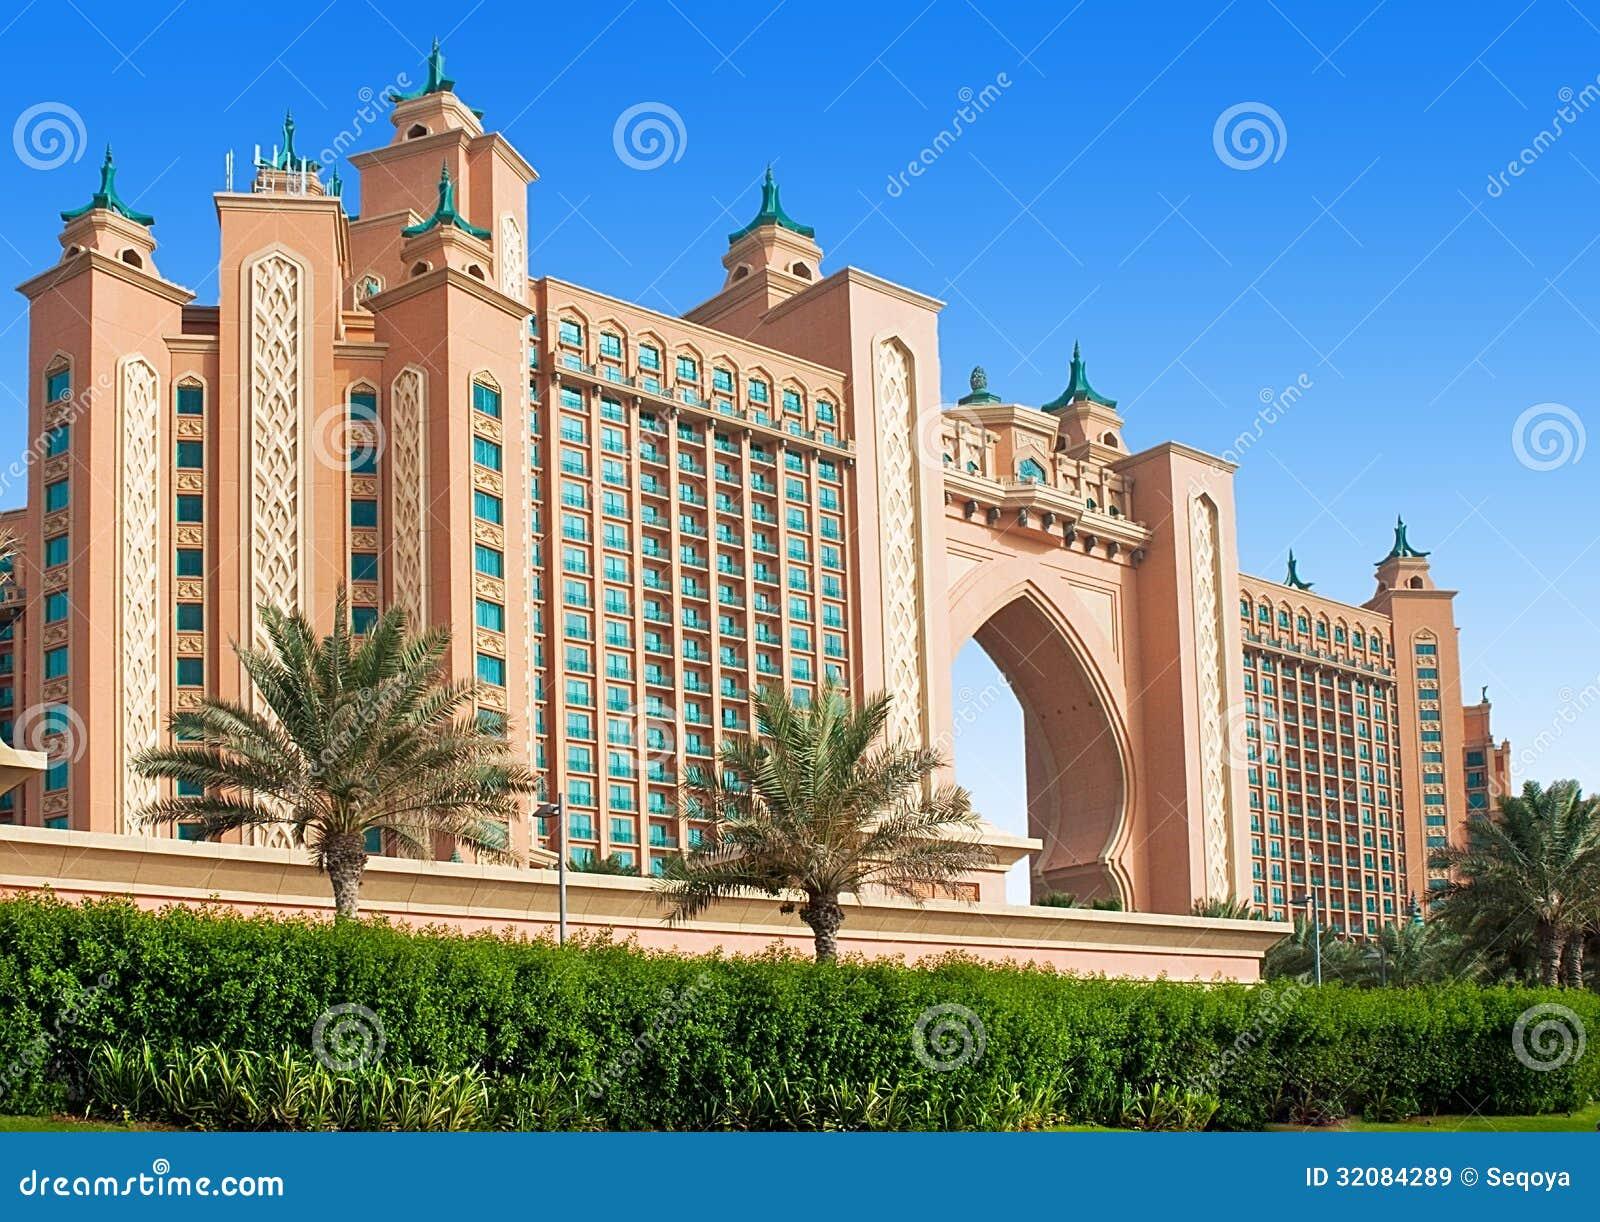 The famous atlantis hotel editorial stock image image for Hotel dubai famous